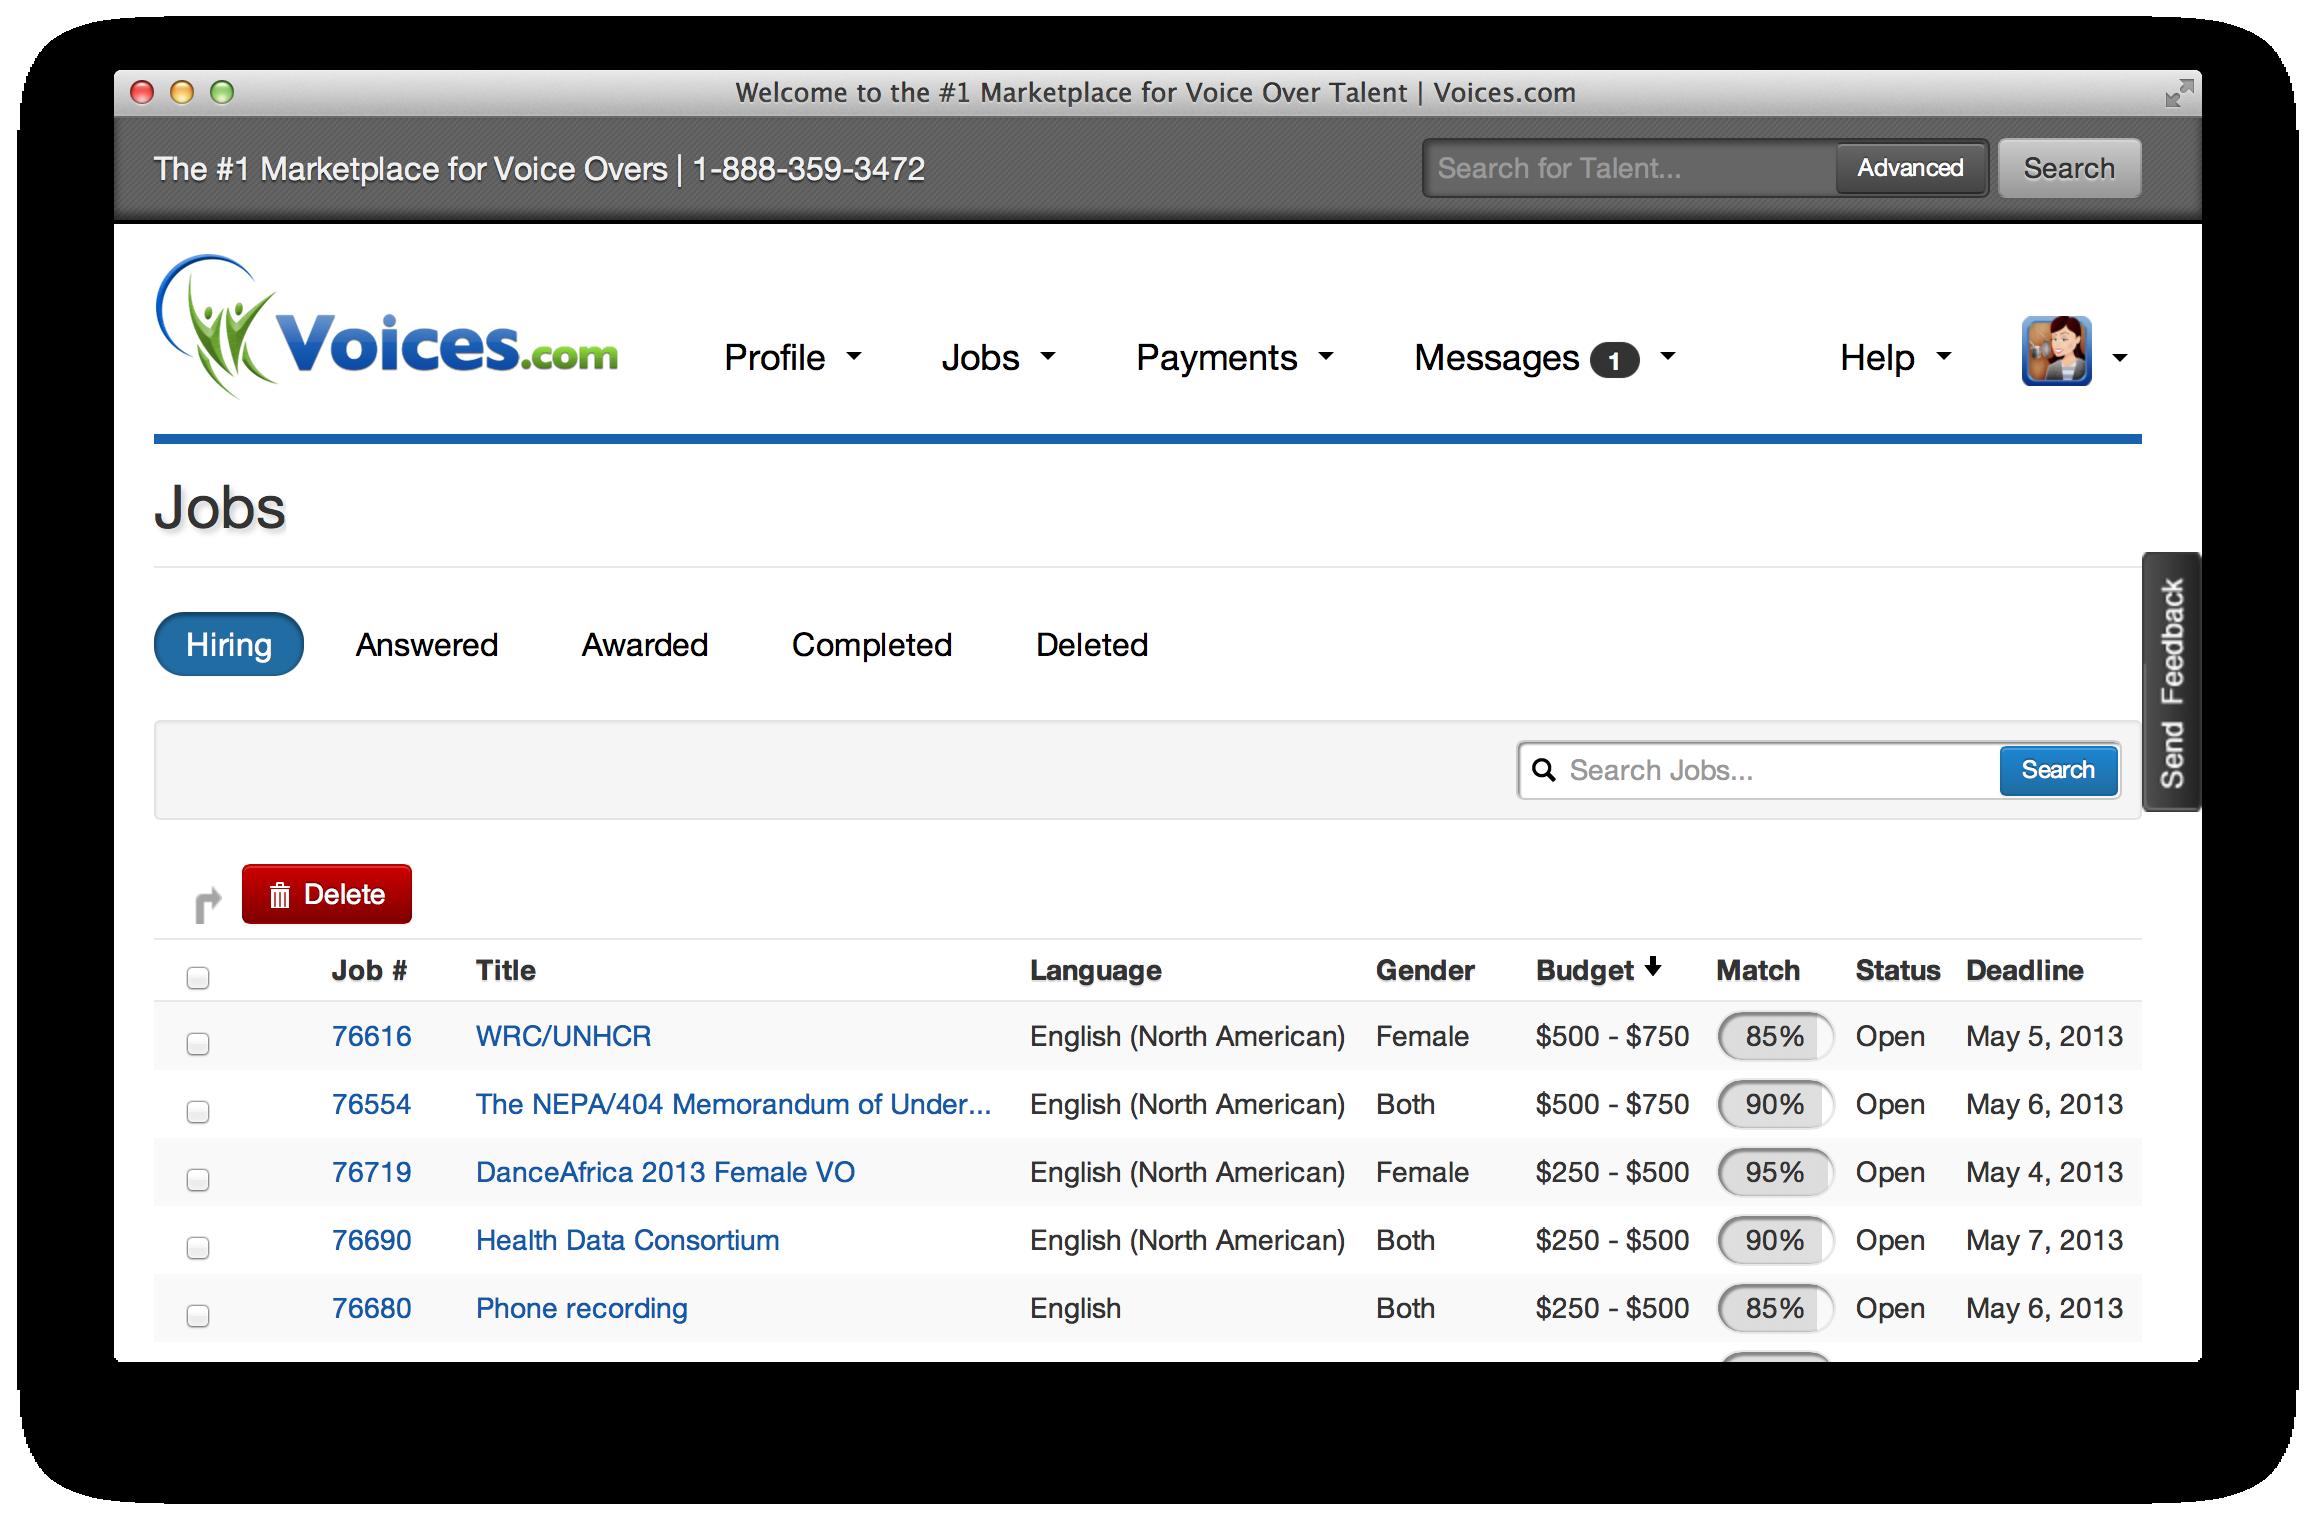 responsive_design_hiring_jobs.png